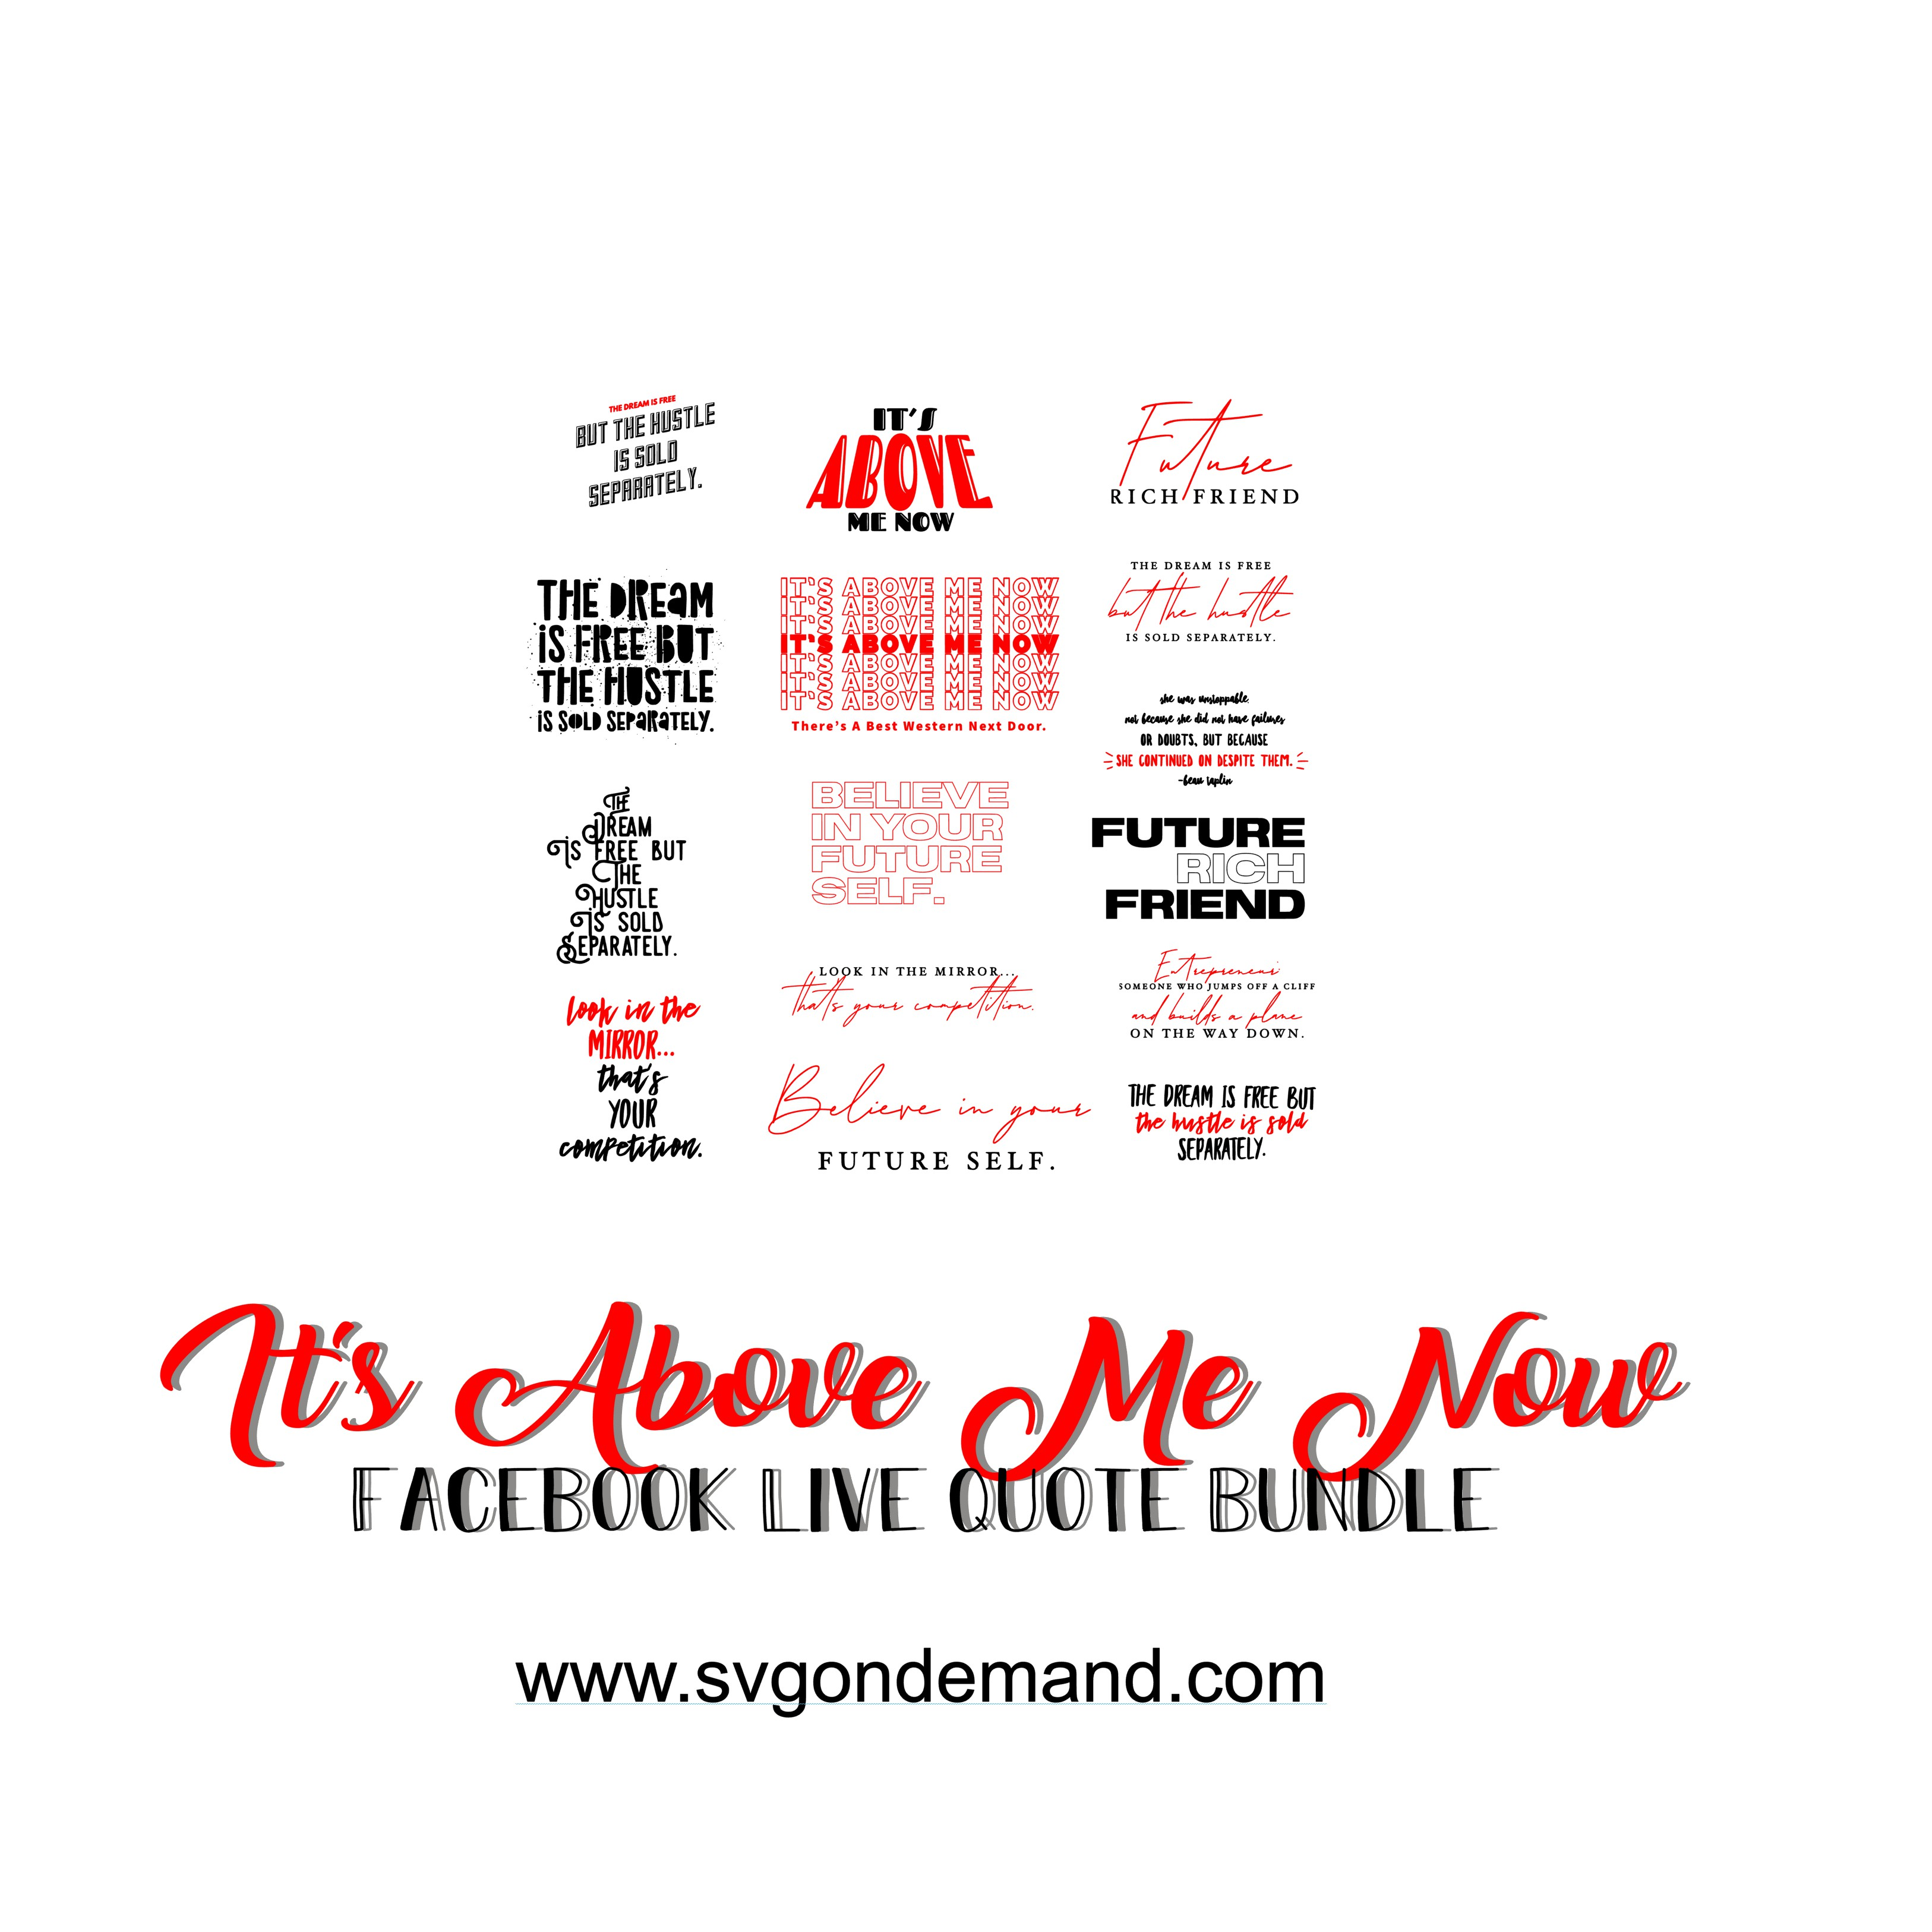 It's Above Me Now - Facebook LIVE Quote Bundle